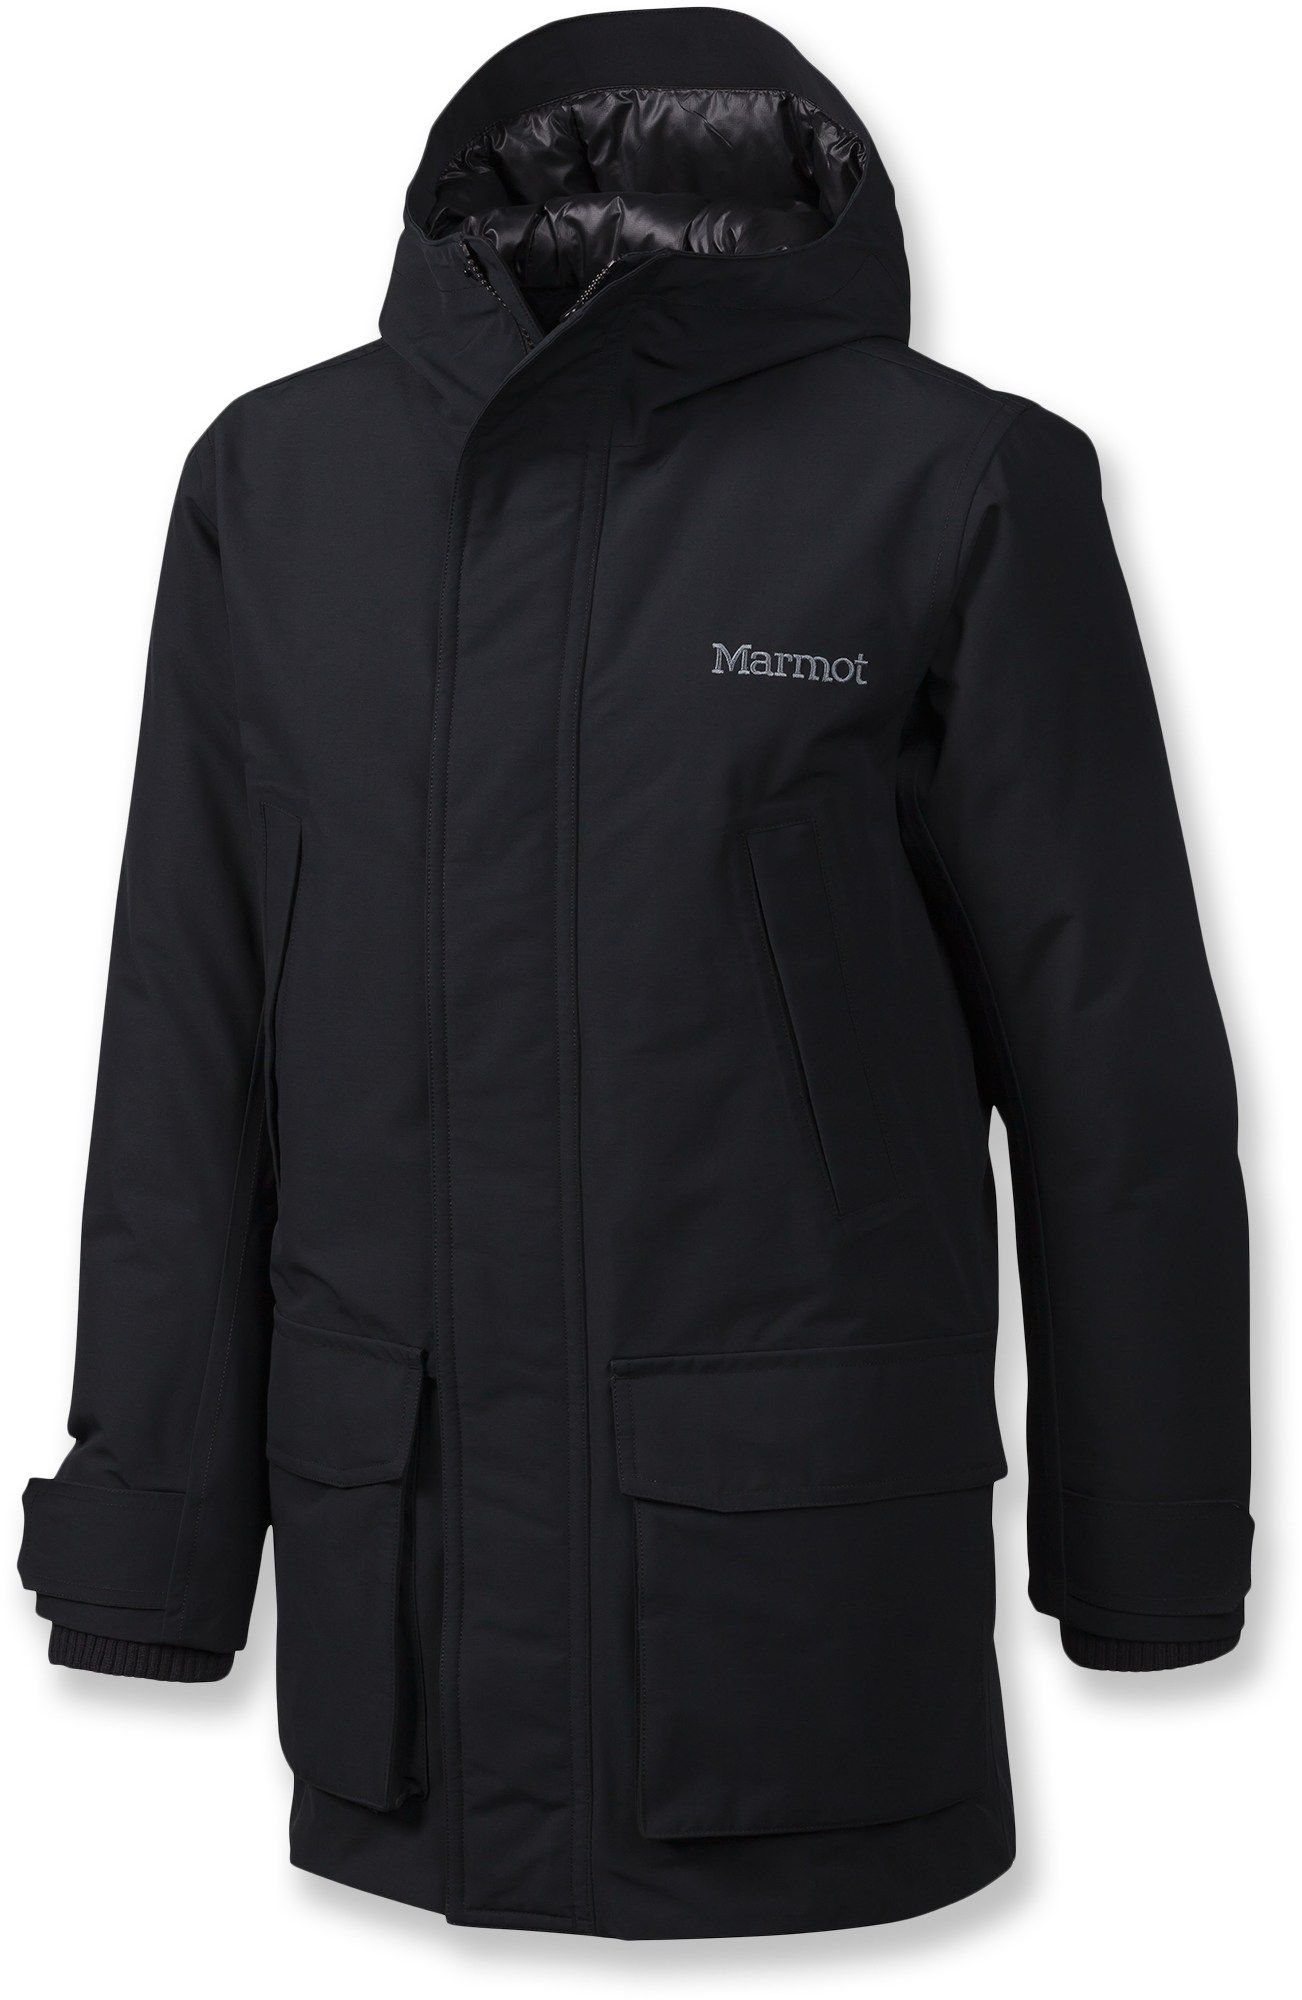 Marmot Male Hampton Jacket - Men' Apparel & Accessories